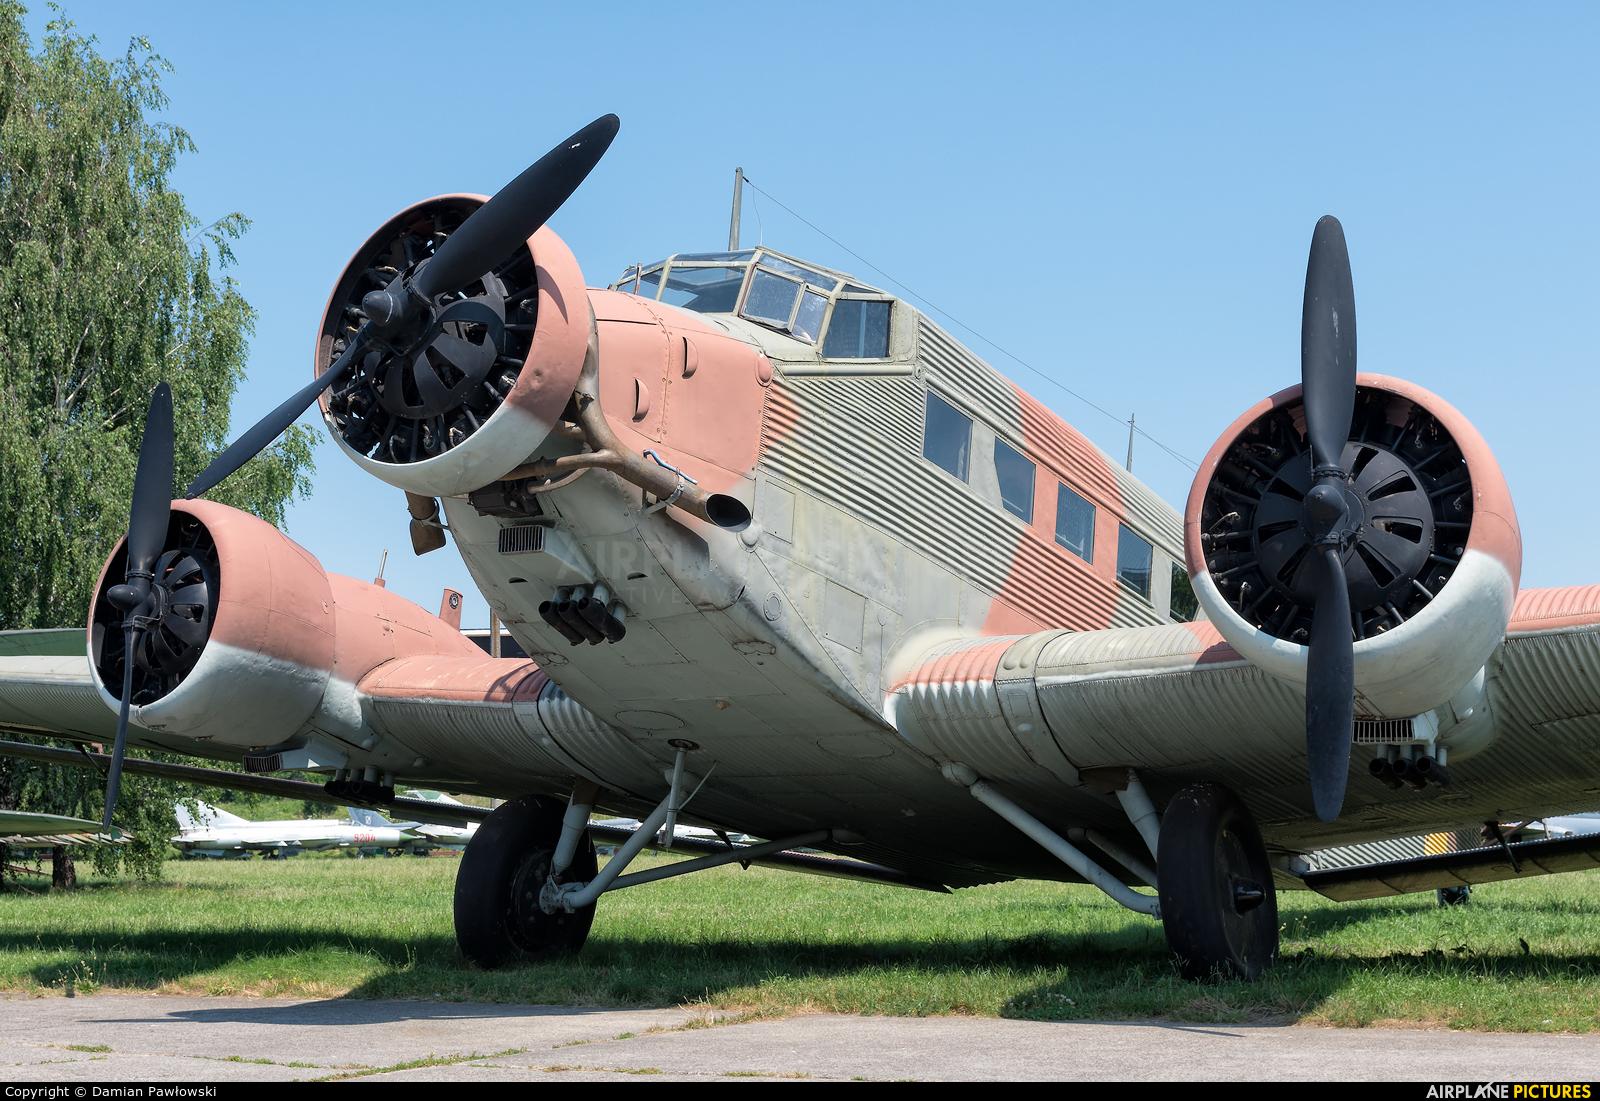 Germany - Air Force 4V-GH aircraft at Kraków, Rakowice Czyżyny - Museum of Polish Aviation